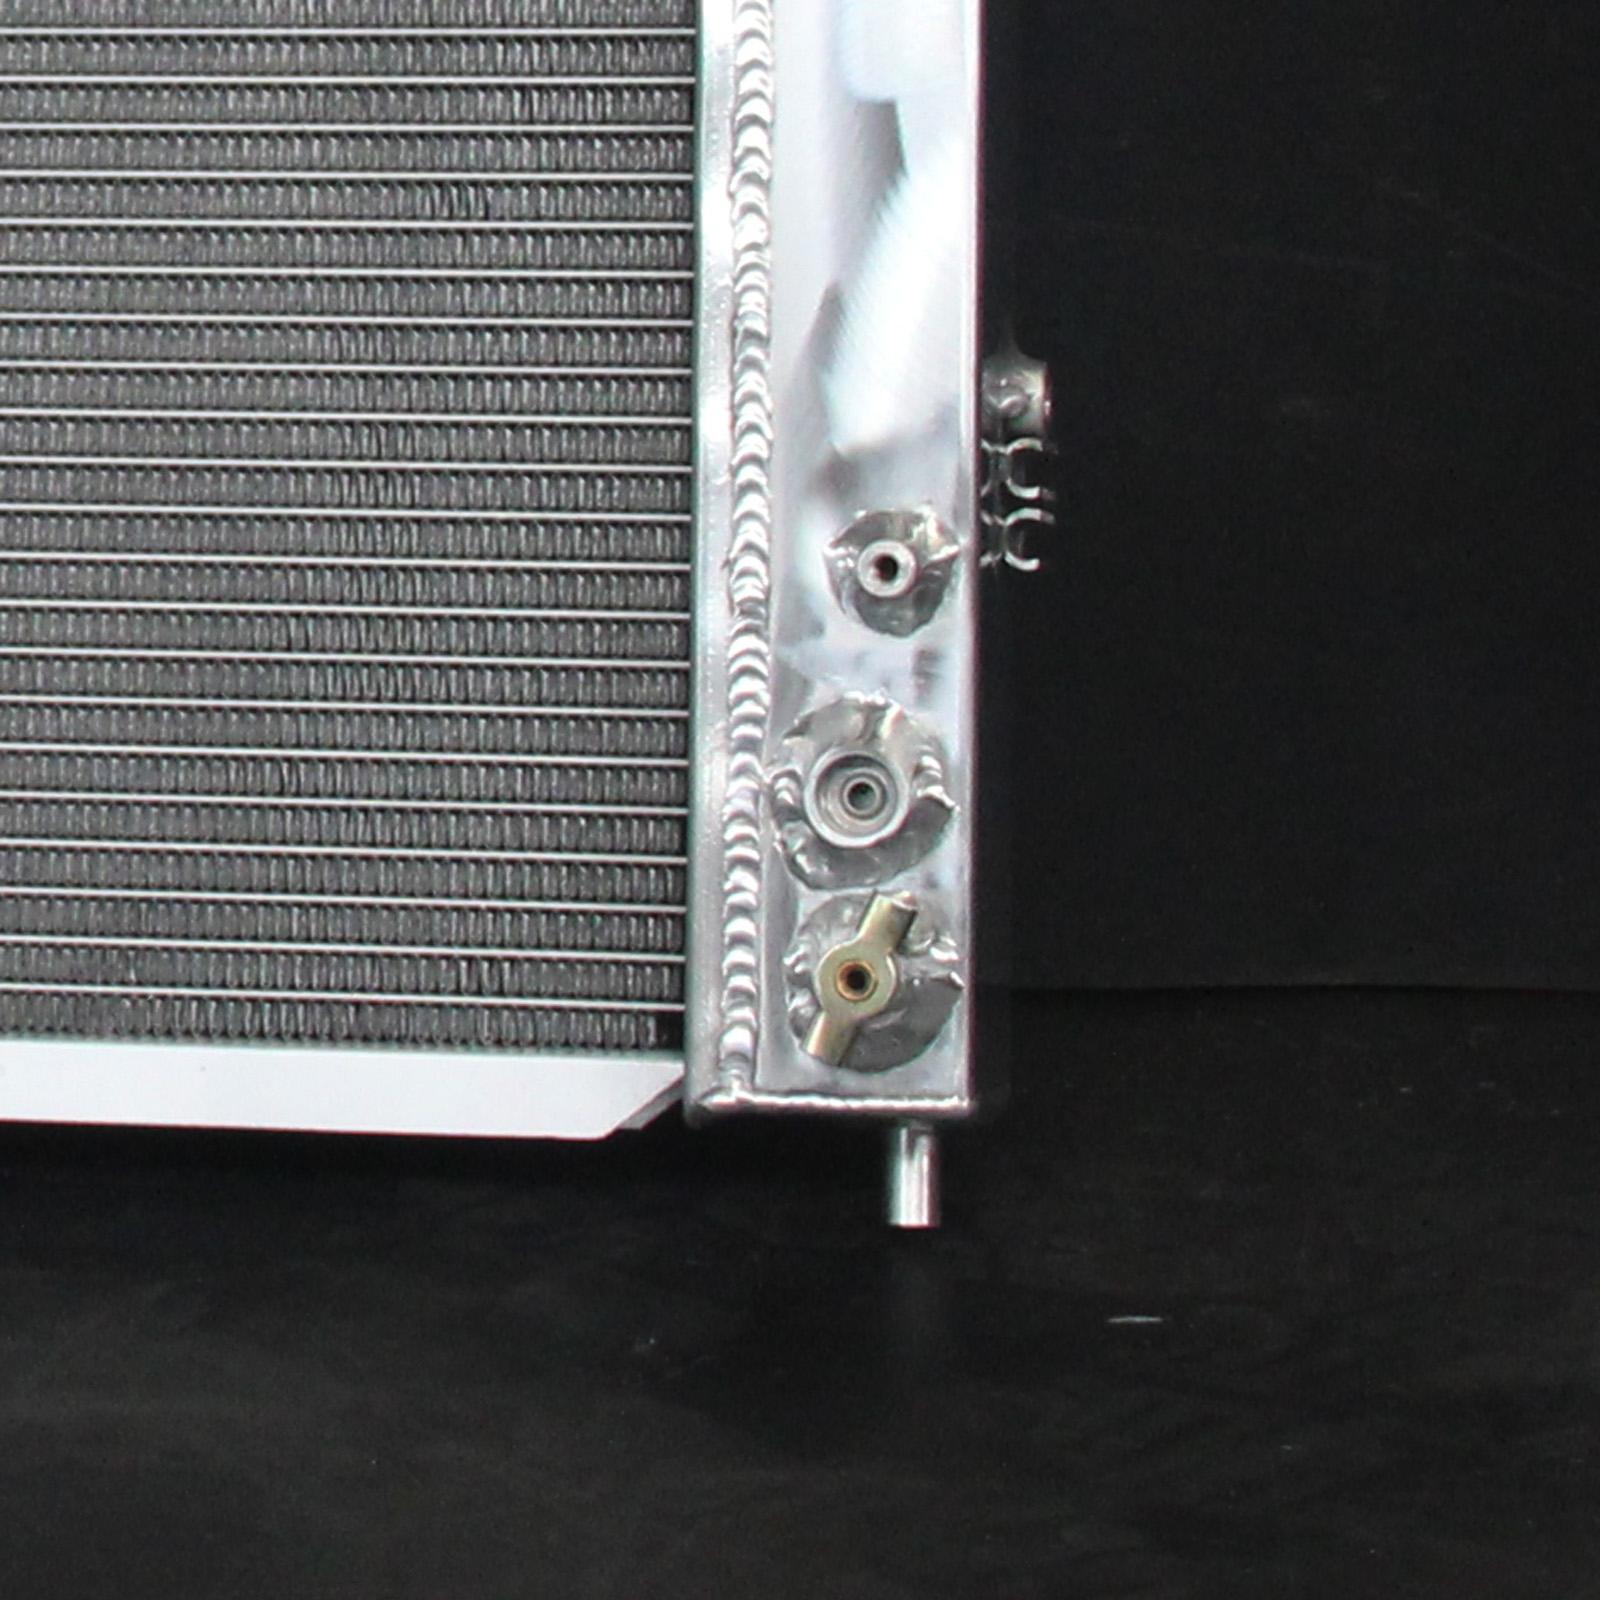 hight resolution of 3 row core aluminum radiator for chrysler 300m intrepid dodge intrepid v6 98 04